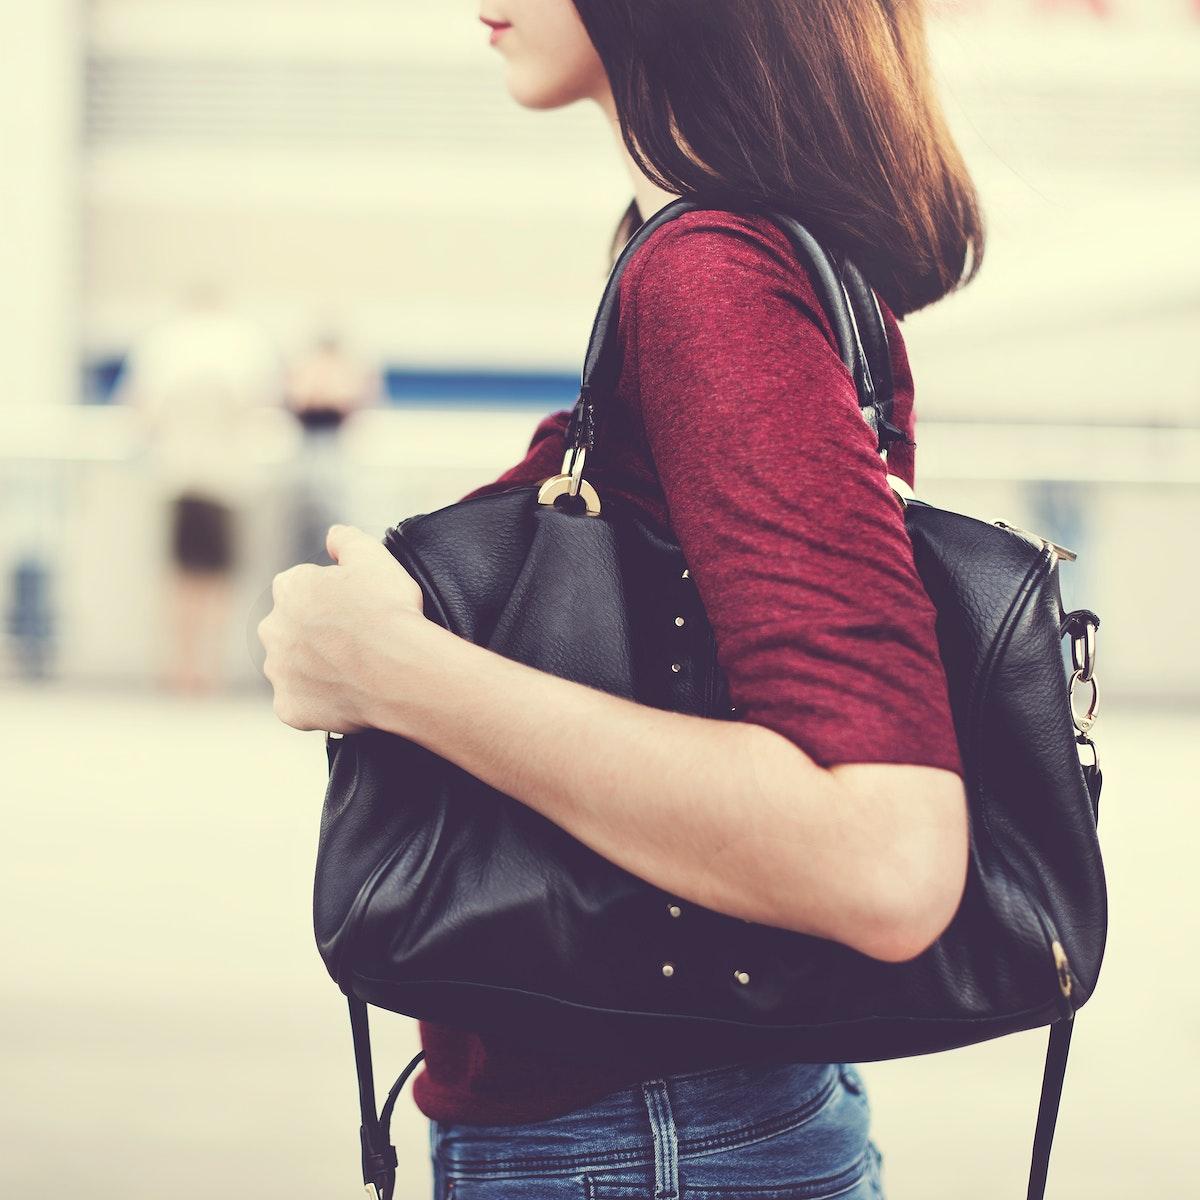 Closeup of woman with shoulder bag